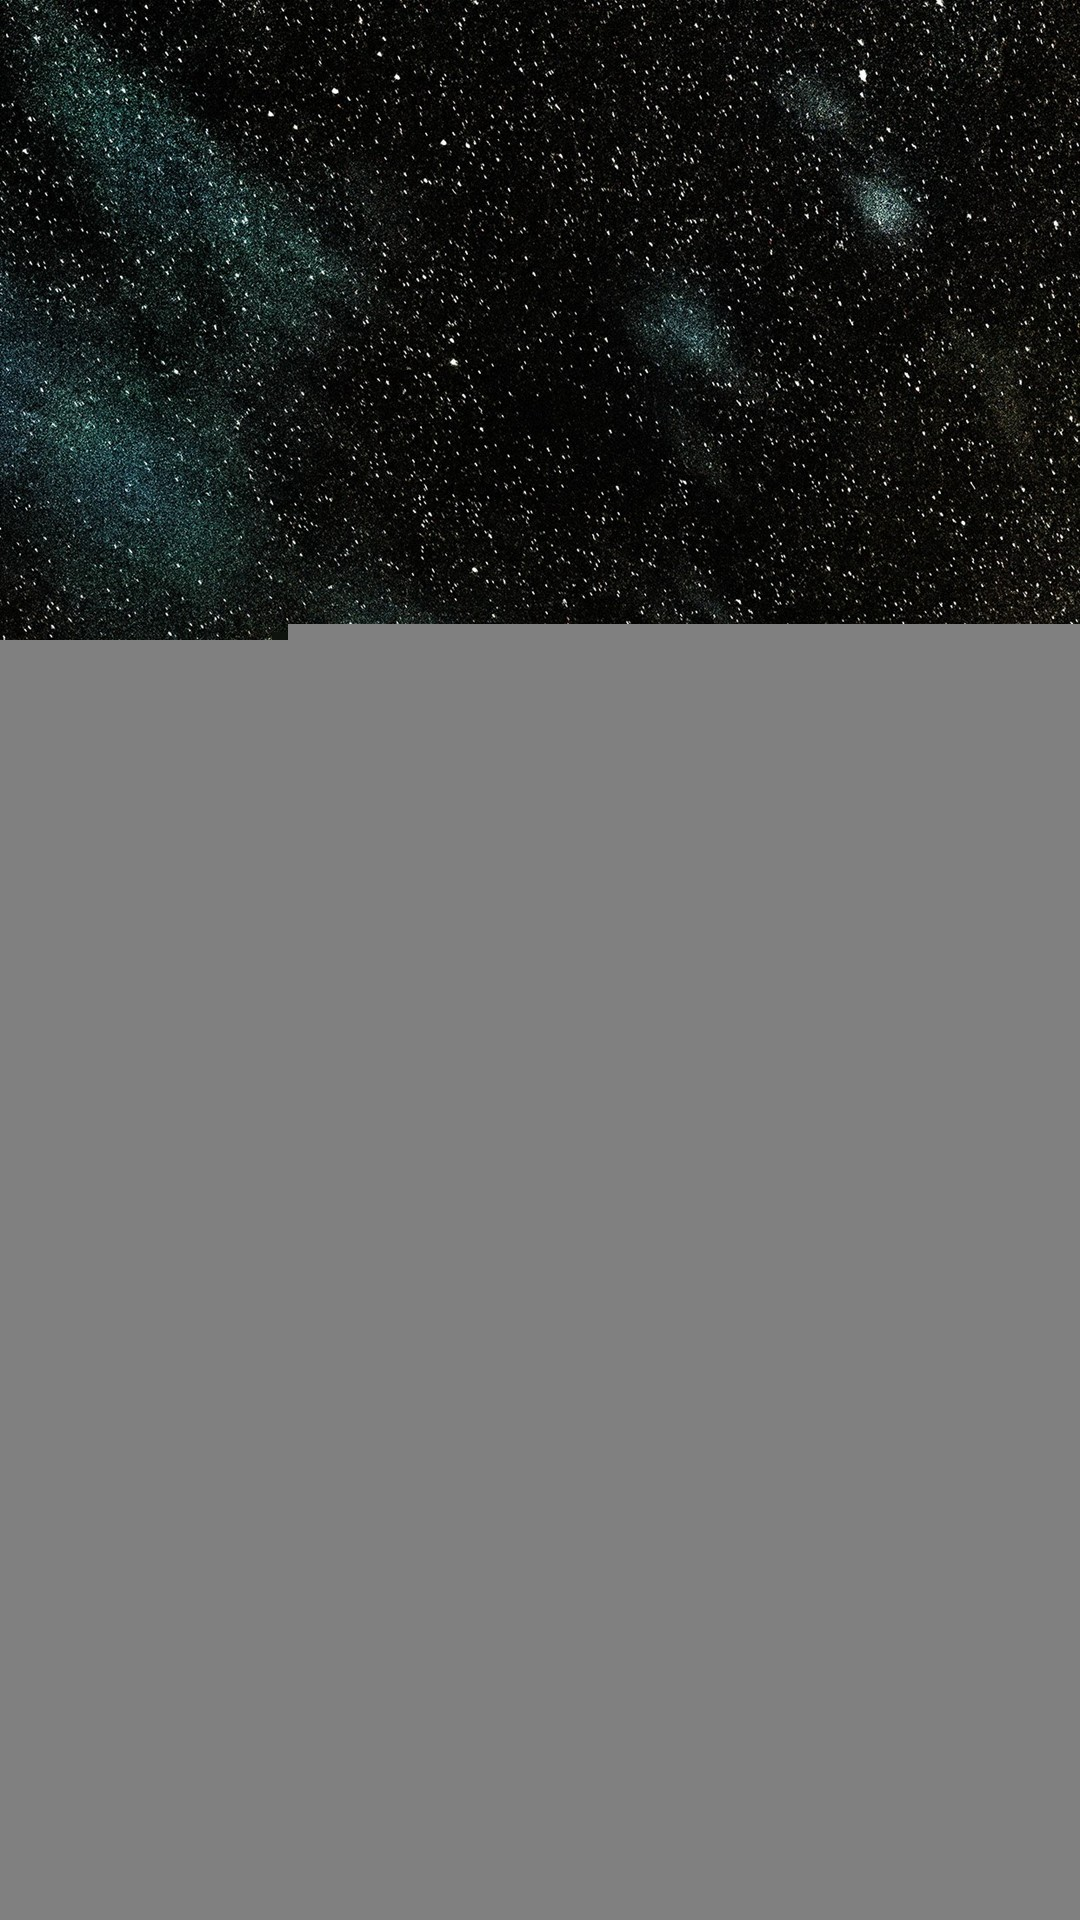 Space Star Night Sky Fall Nature Wood Dark Blue iPhone 8 wallpaper